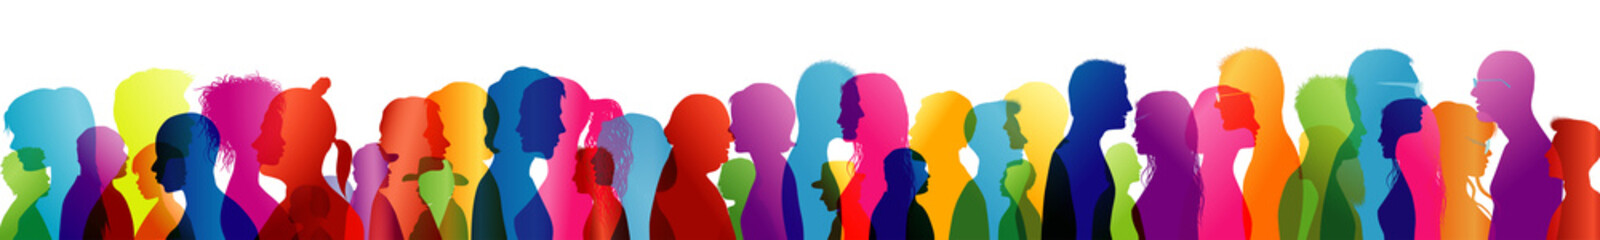 Crowd noise. Noisy people. Talking crowd. People talking. Colored silhouette profiles. Multiple exposure Fototapete